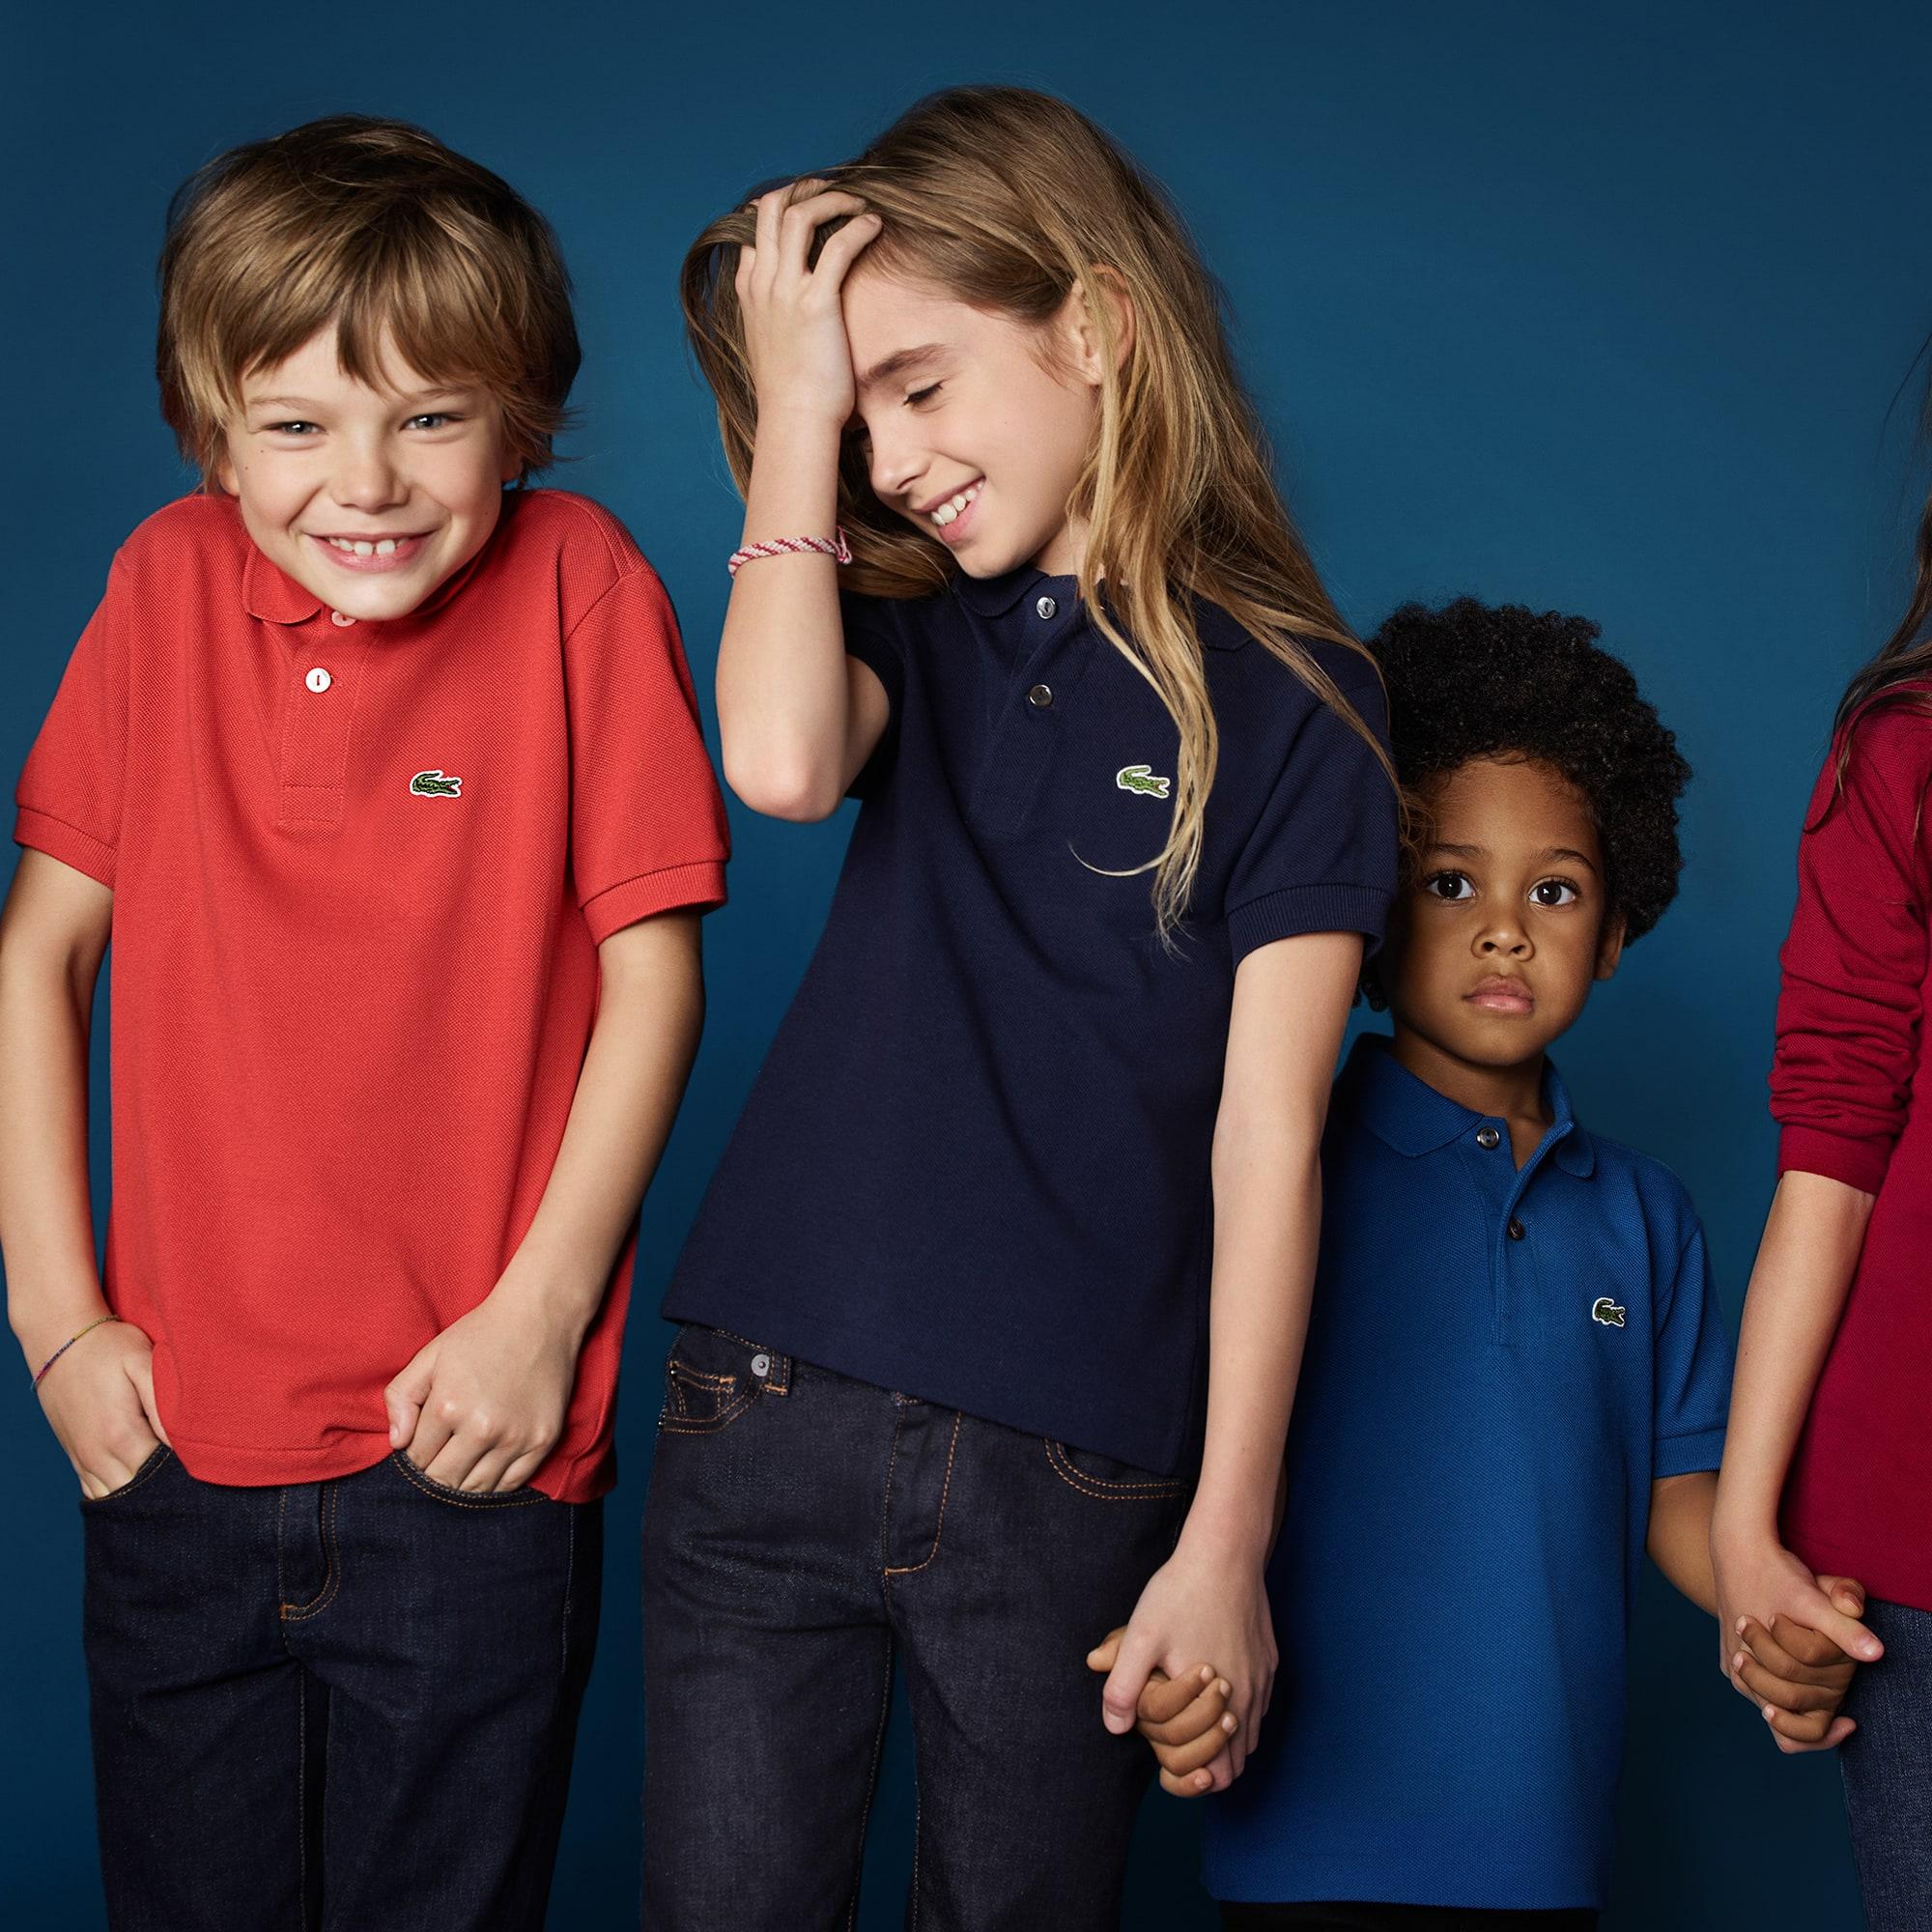 JAKO Unisex Kids Classico Childrens Polo